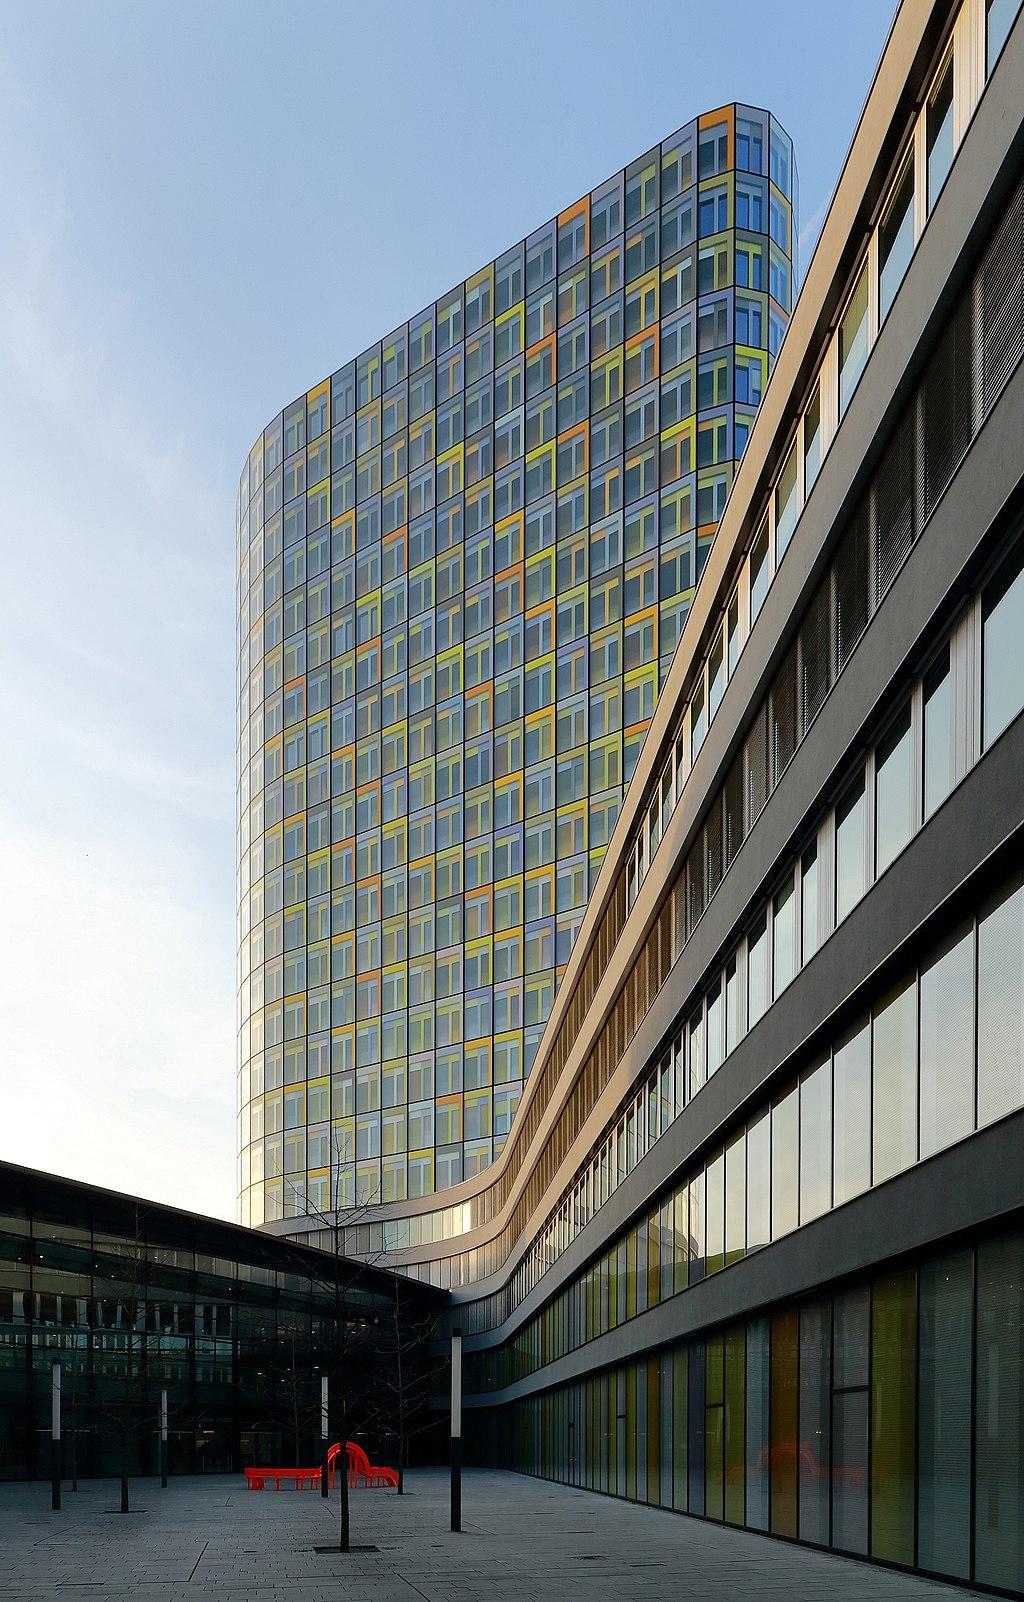 ADAC-Zentrale, Munich, March 2017-01.jpg